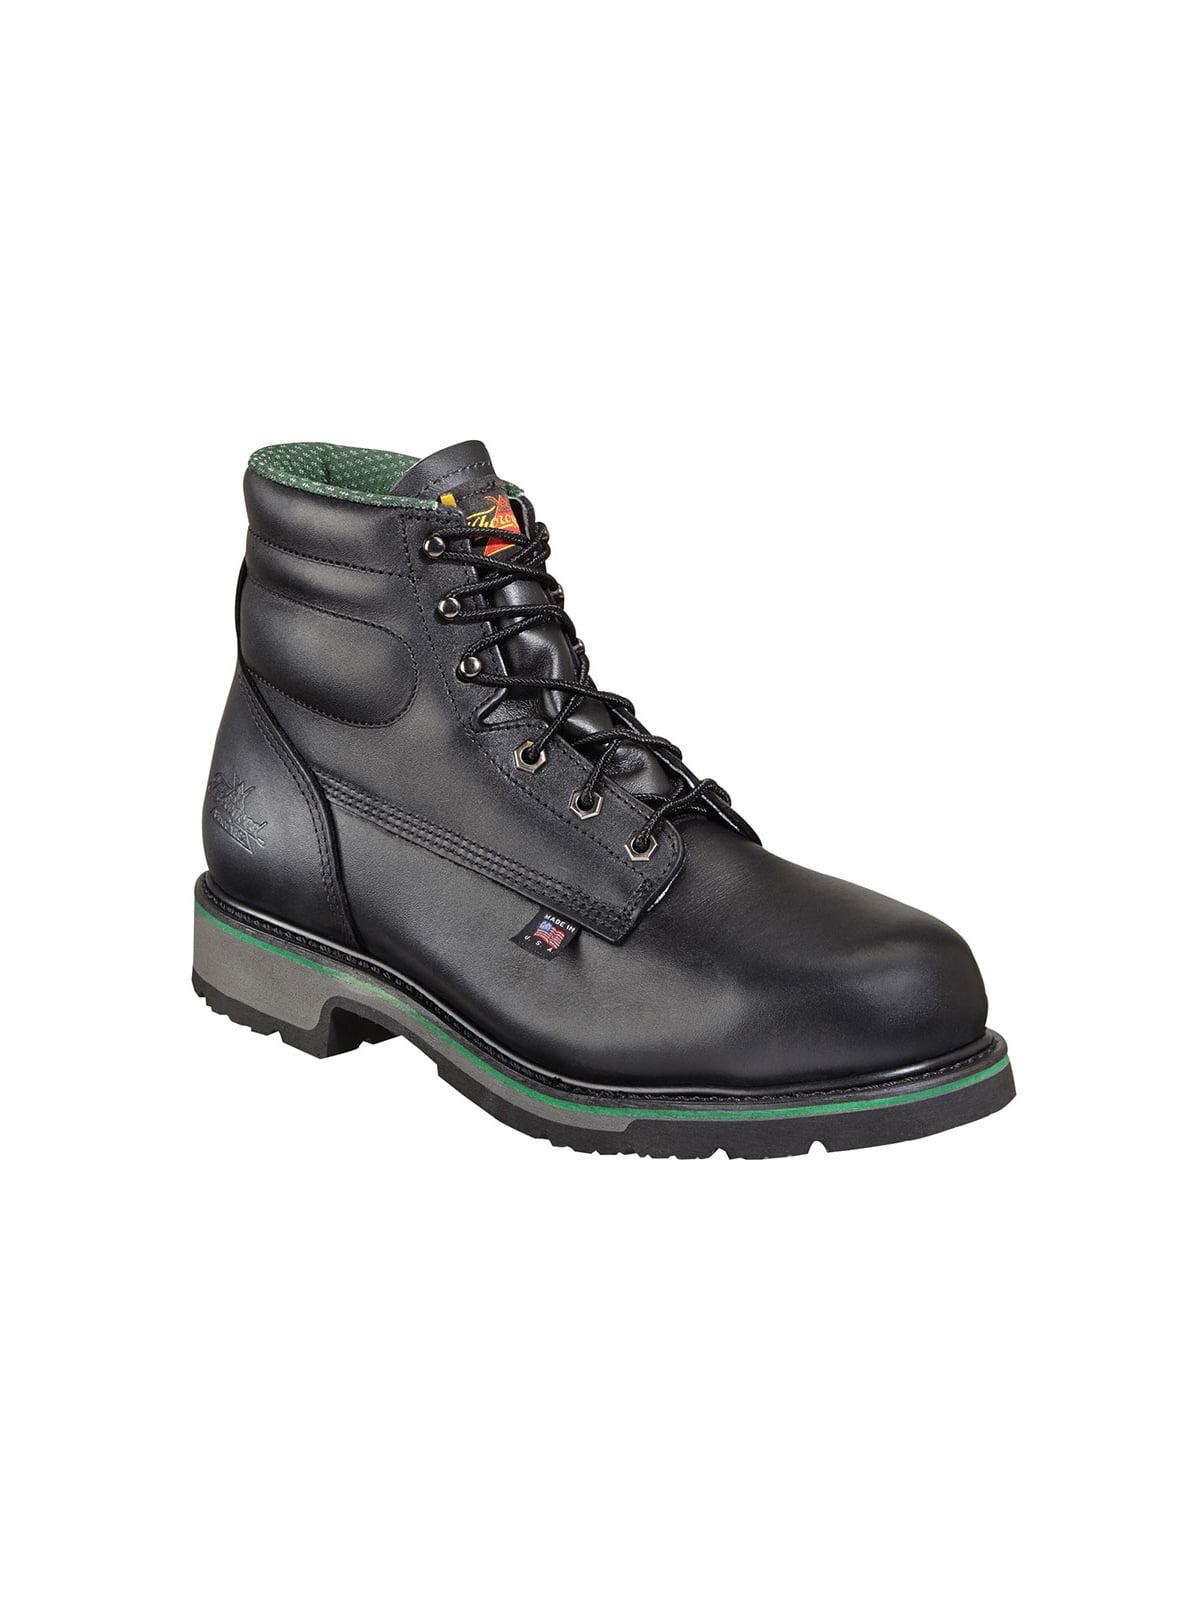 82774e3ca72 Thorogood Work Boots Mens 6